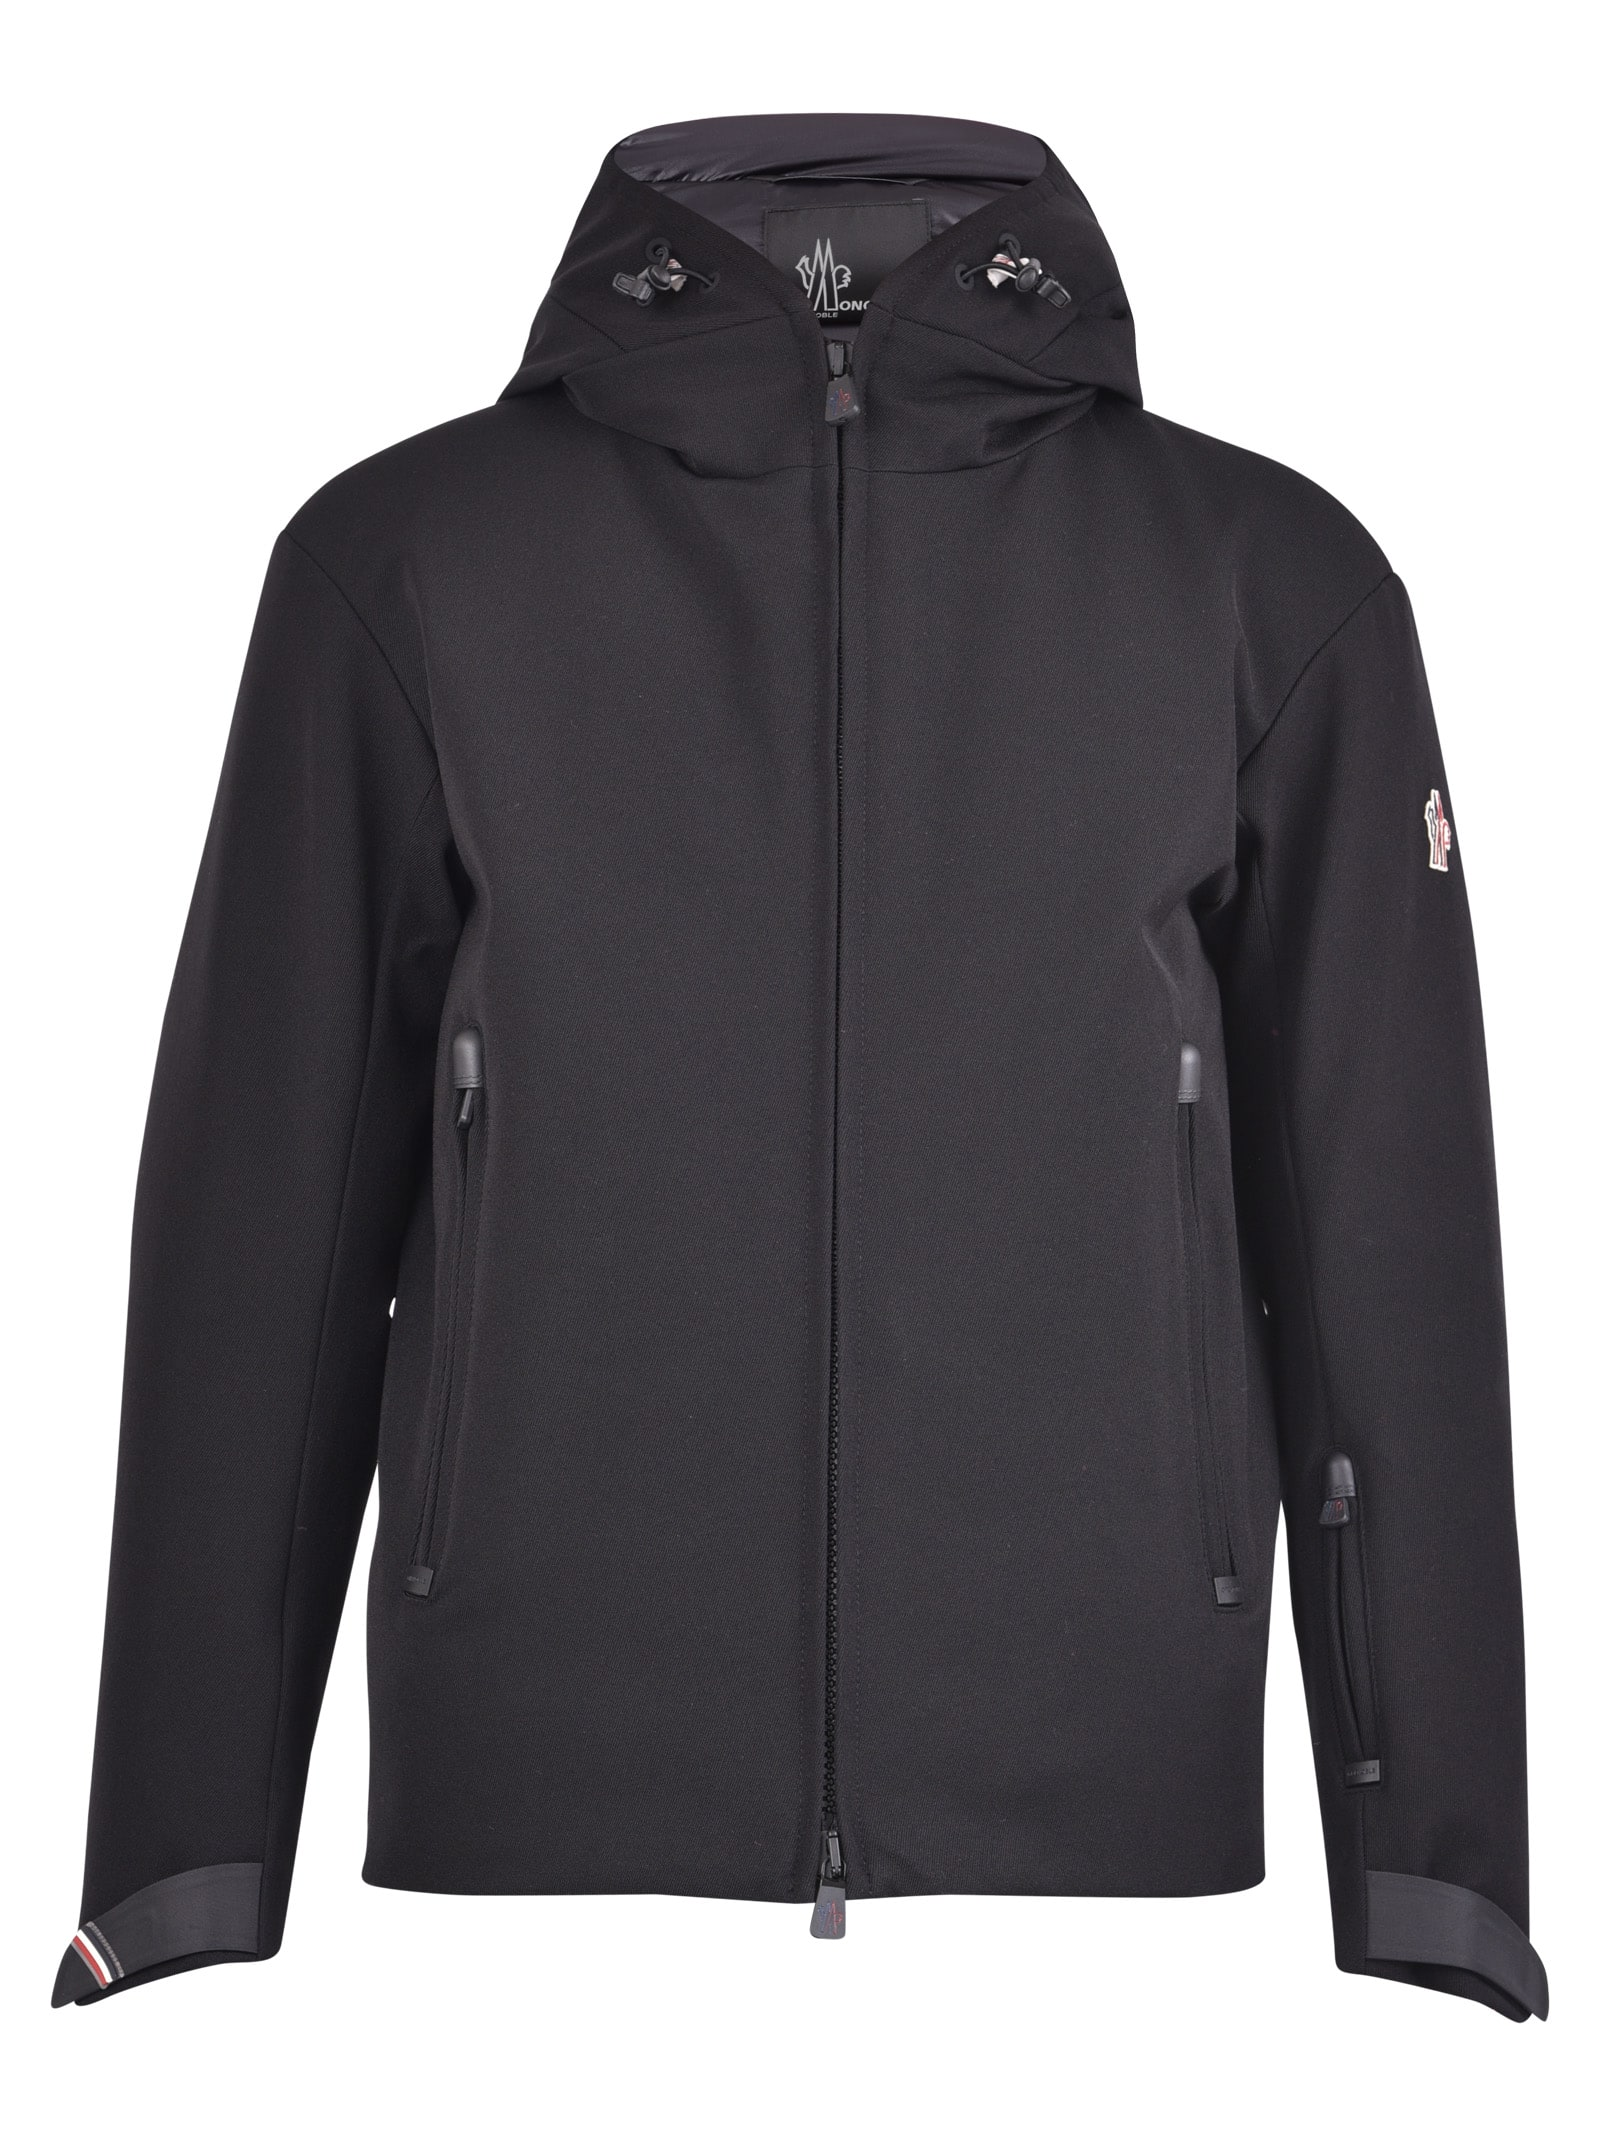 Moncler Grenoble Praz Jacket